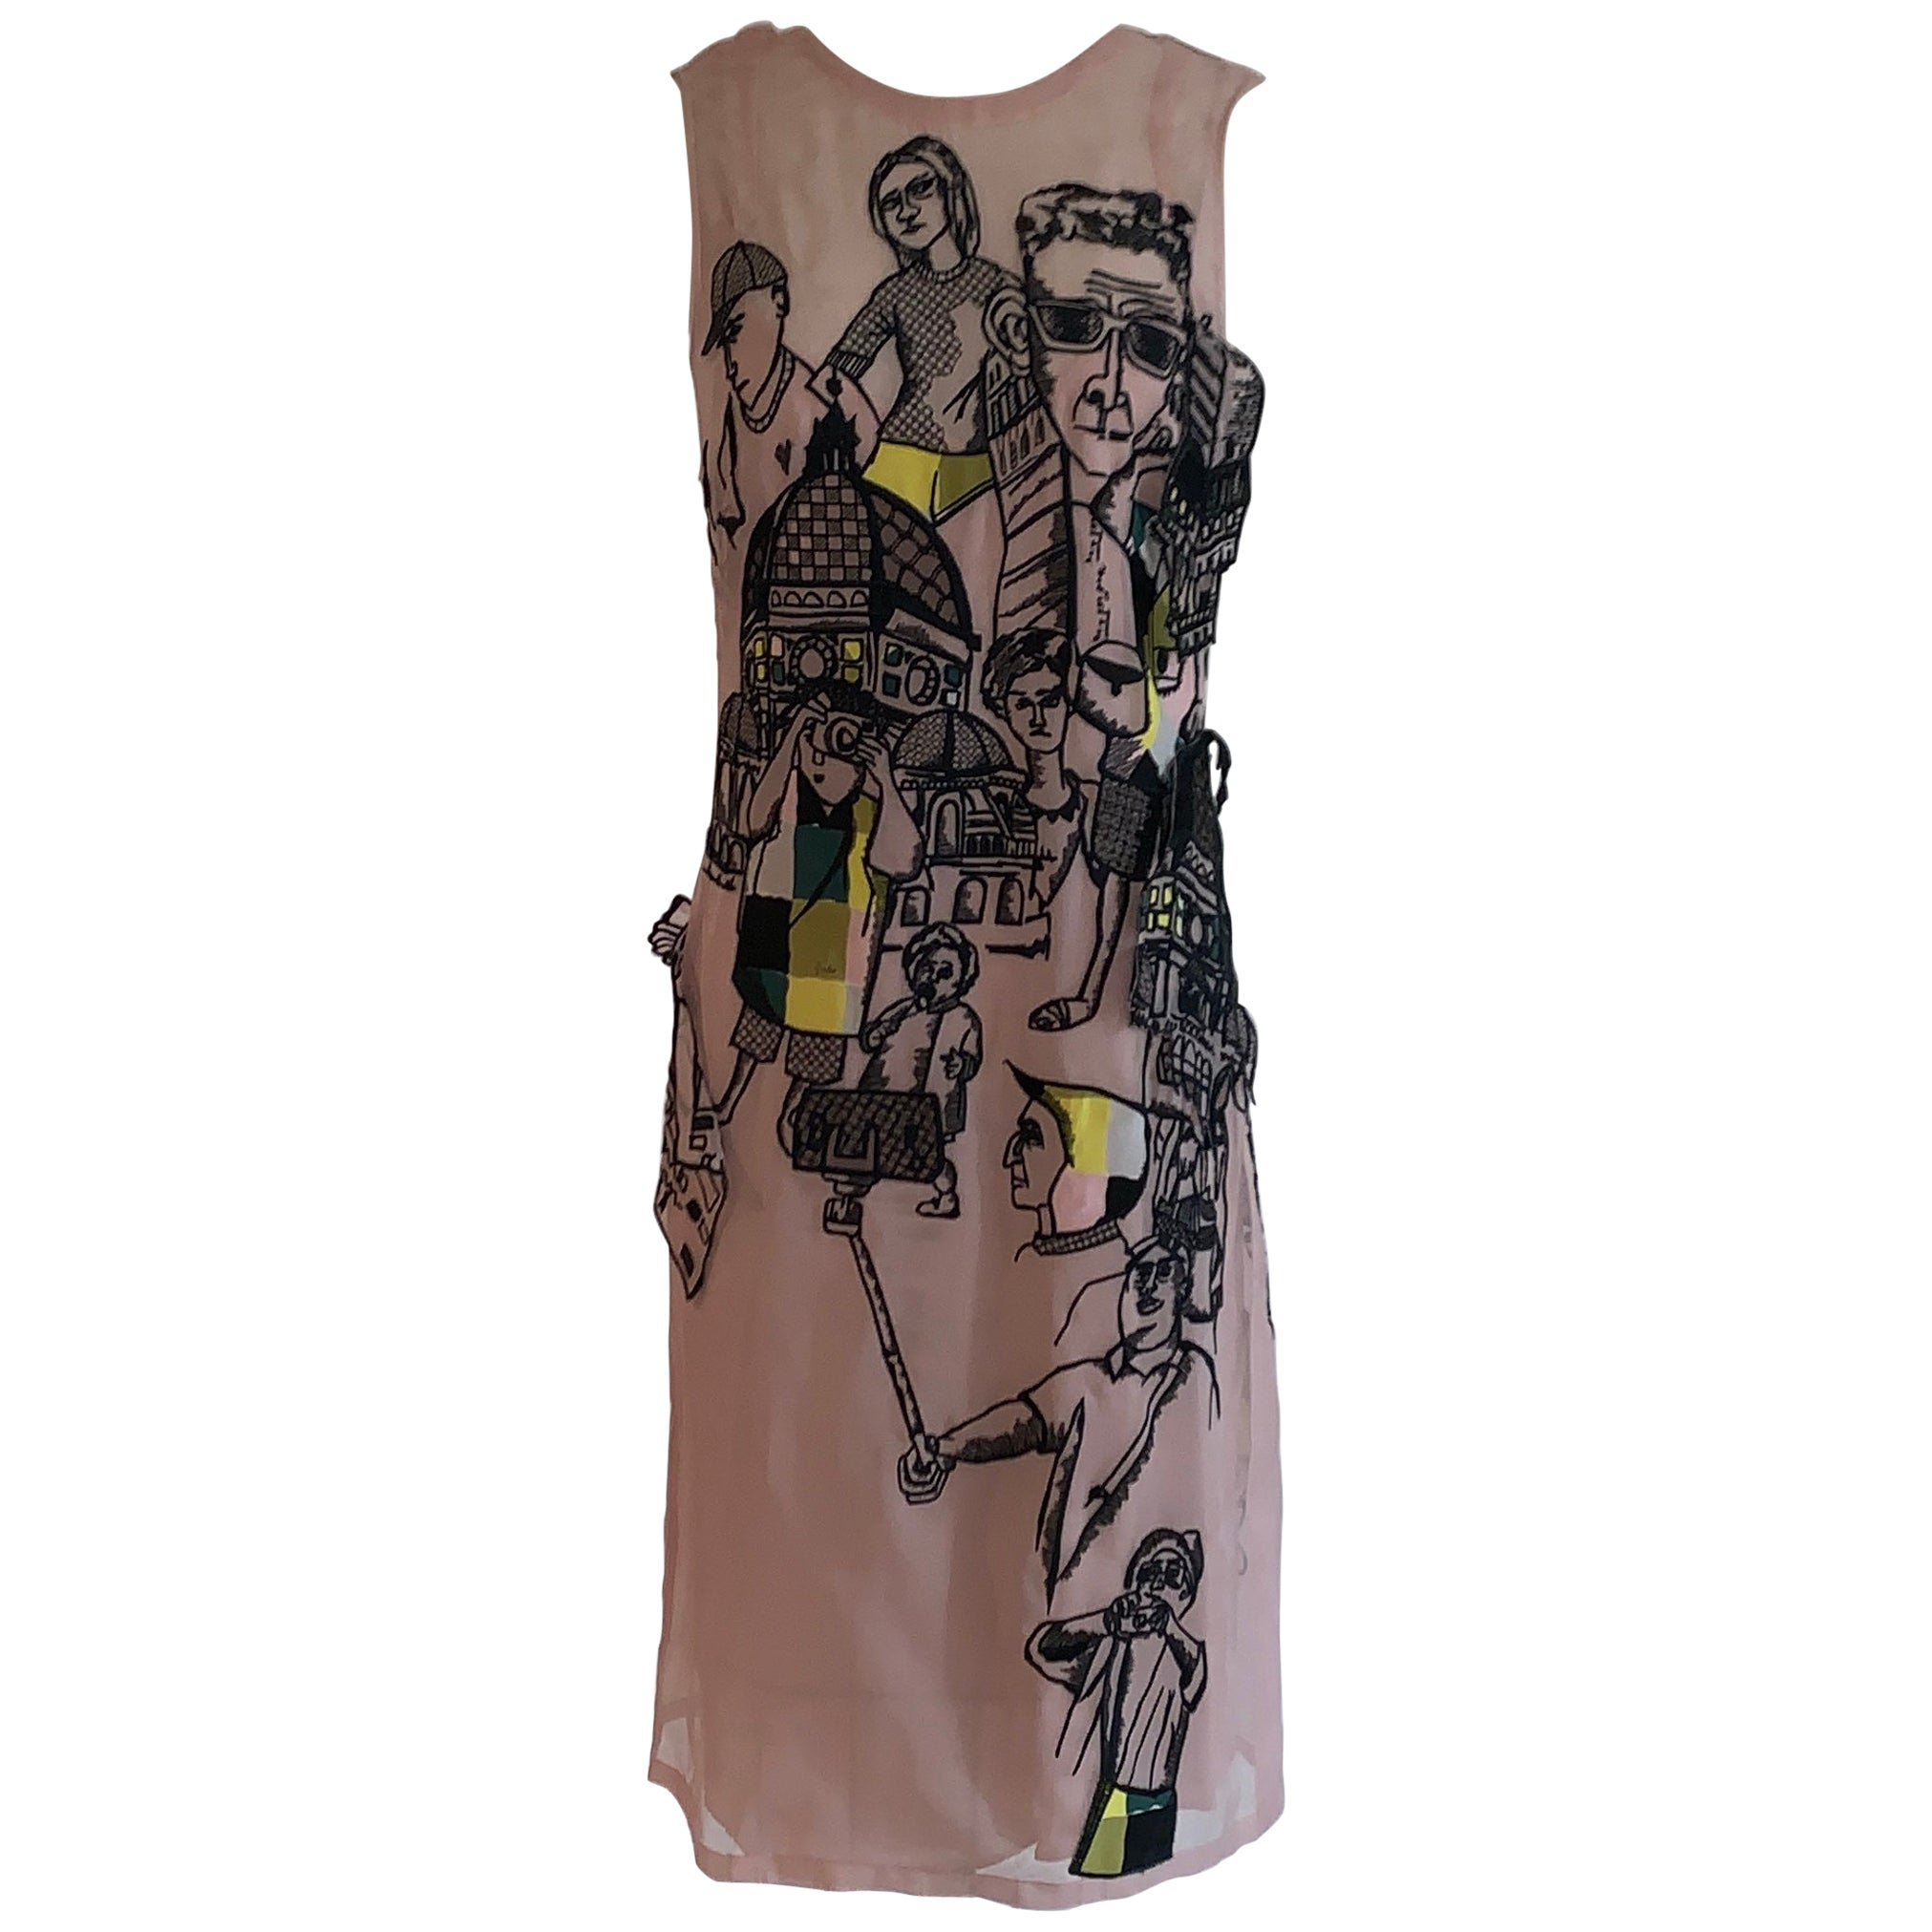 Emilio Pucci Blush Pink Embroidered Tourist PrintShift  Dress with Applique